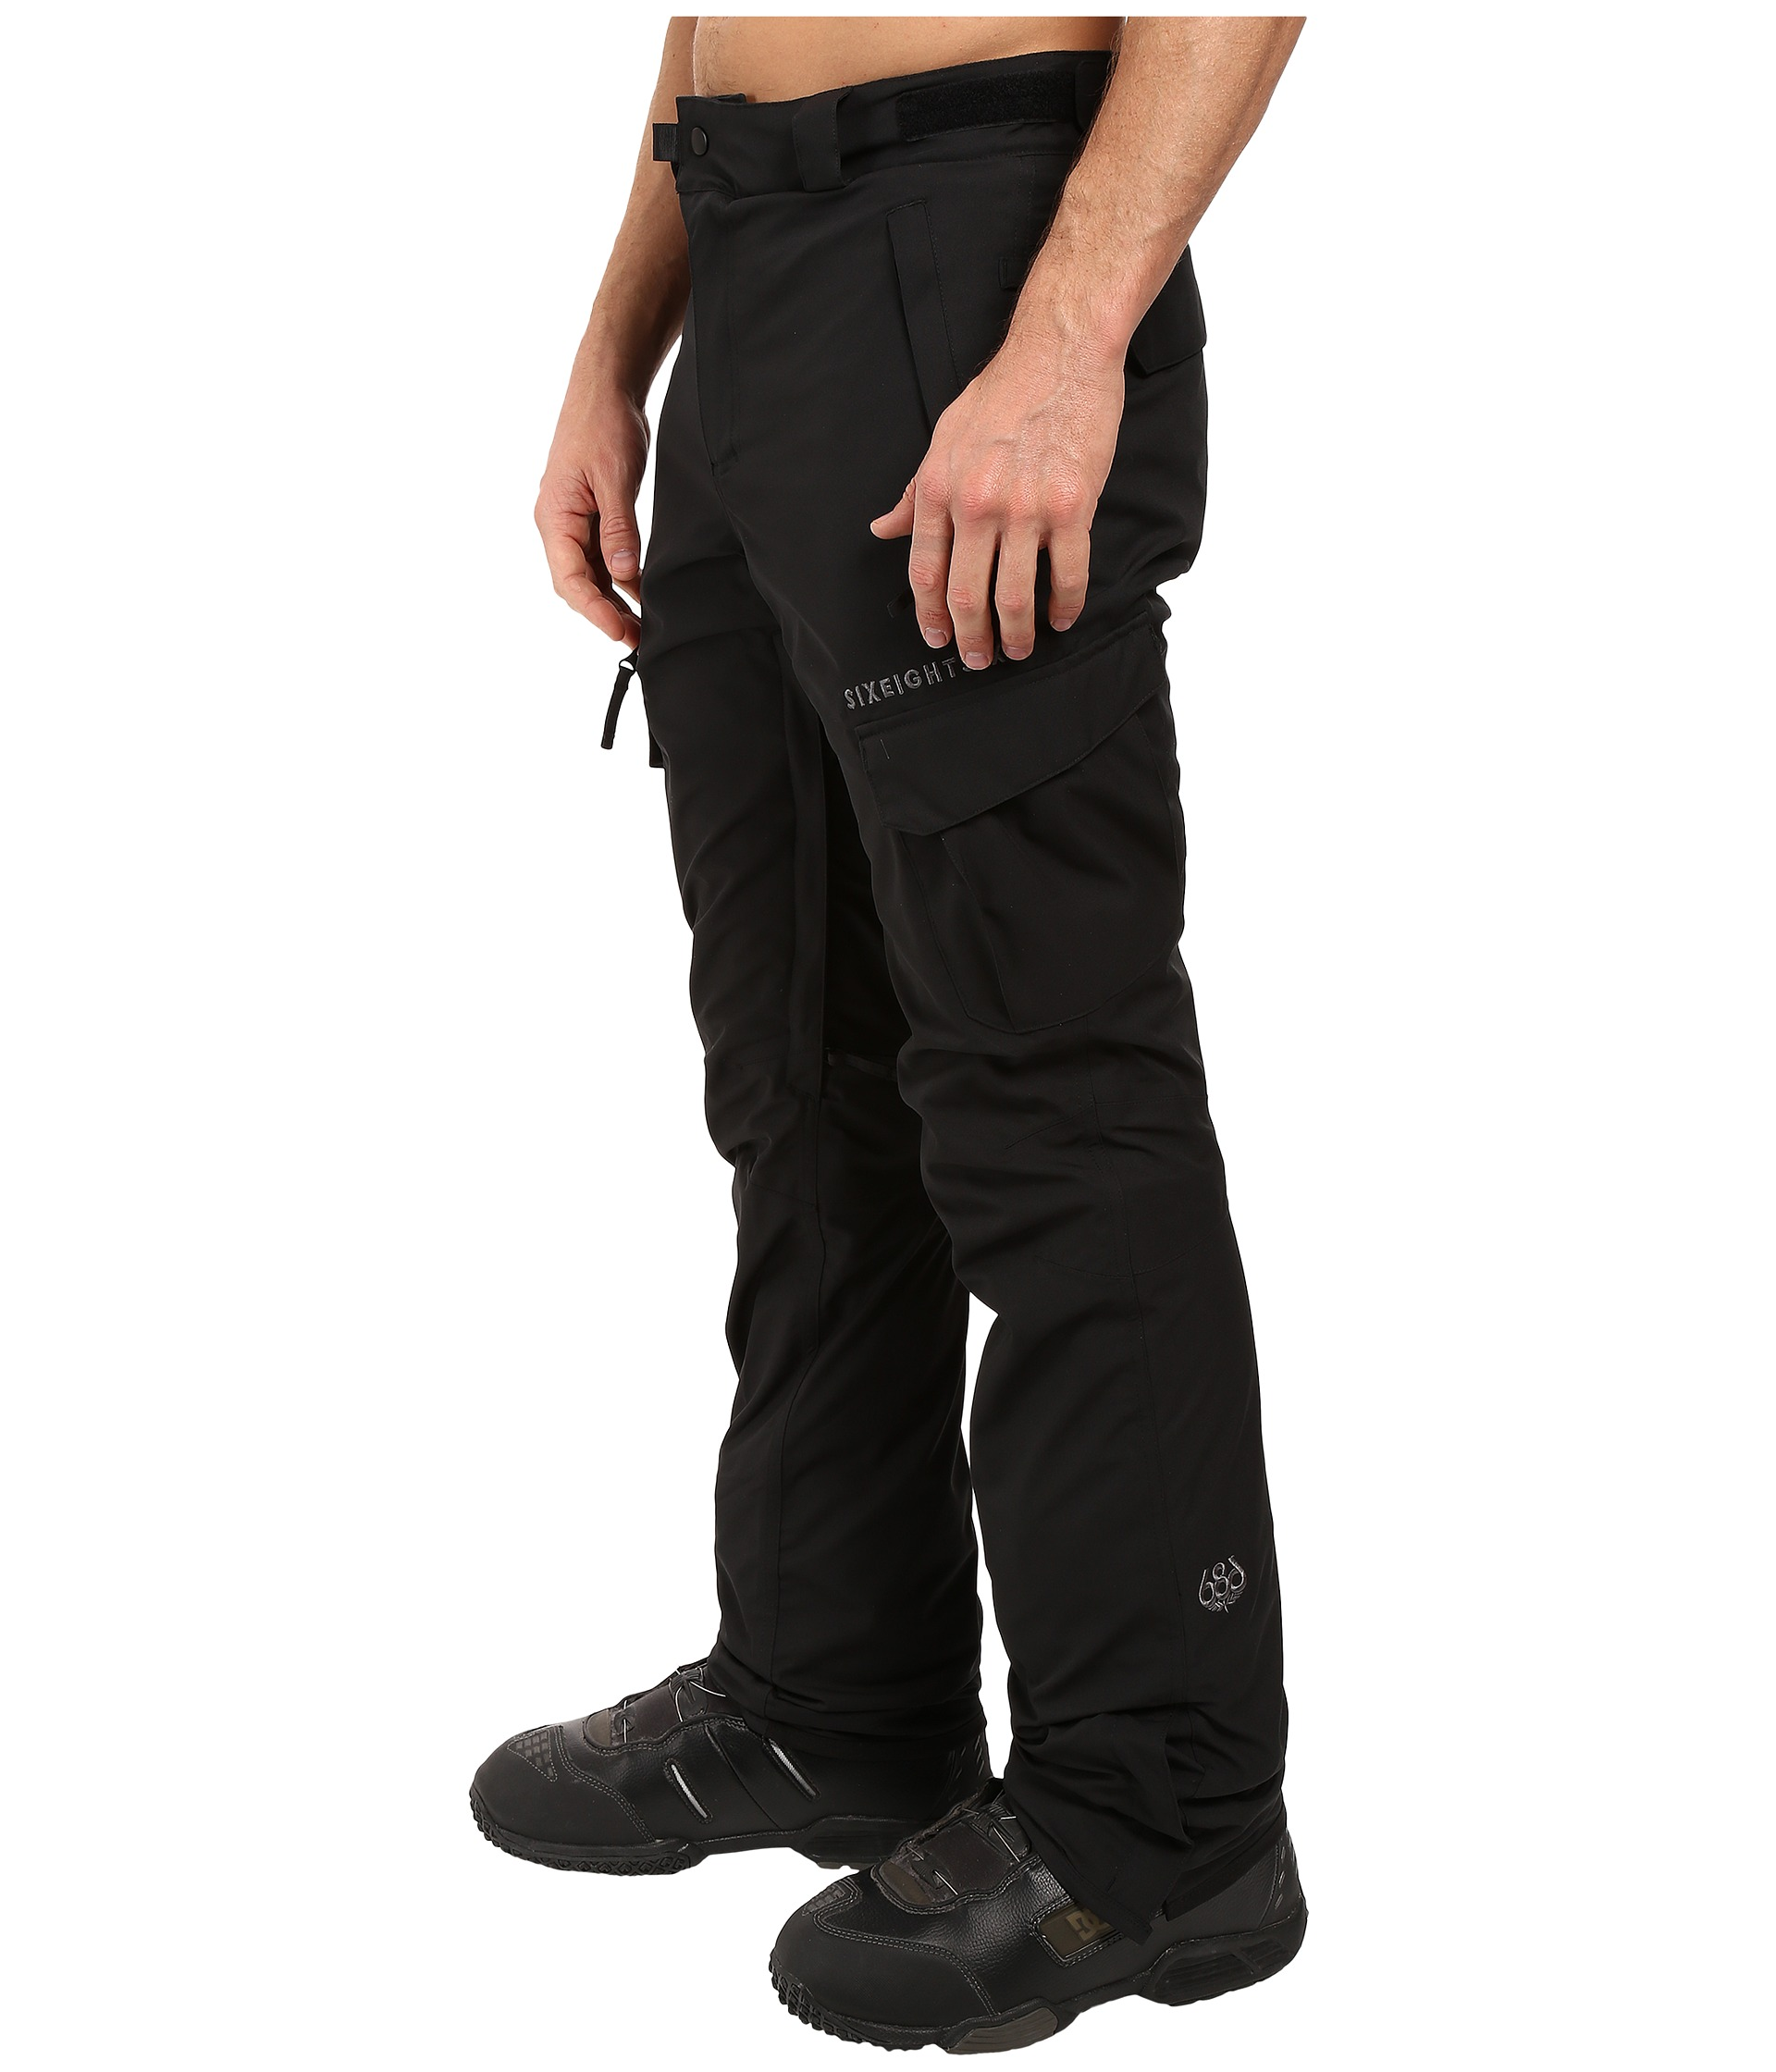 686 Authentic Smarty Cargo Pants Black Long